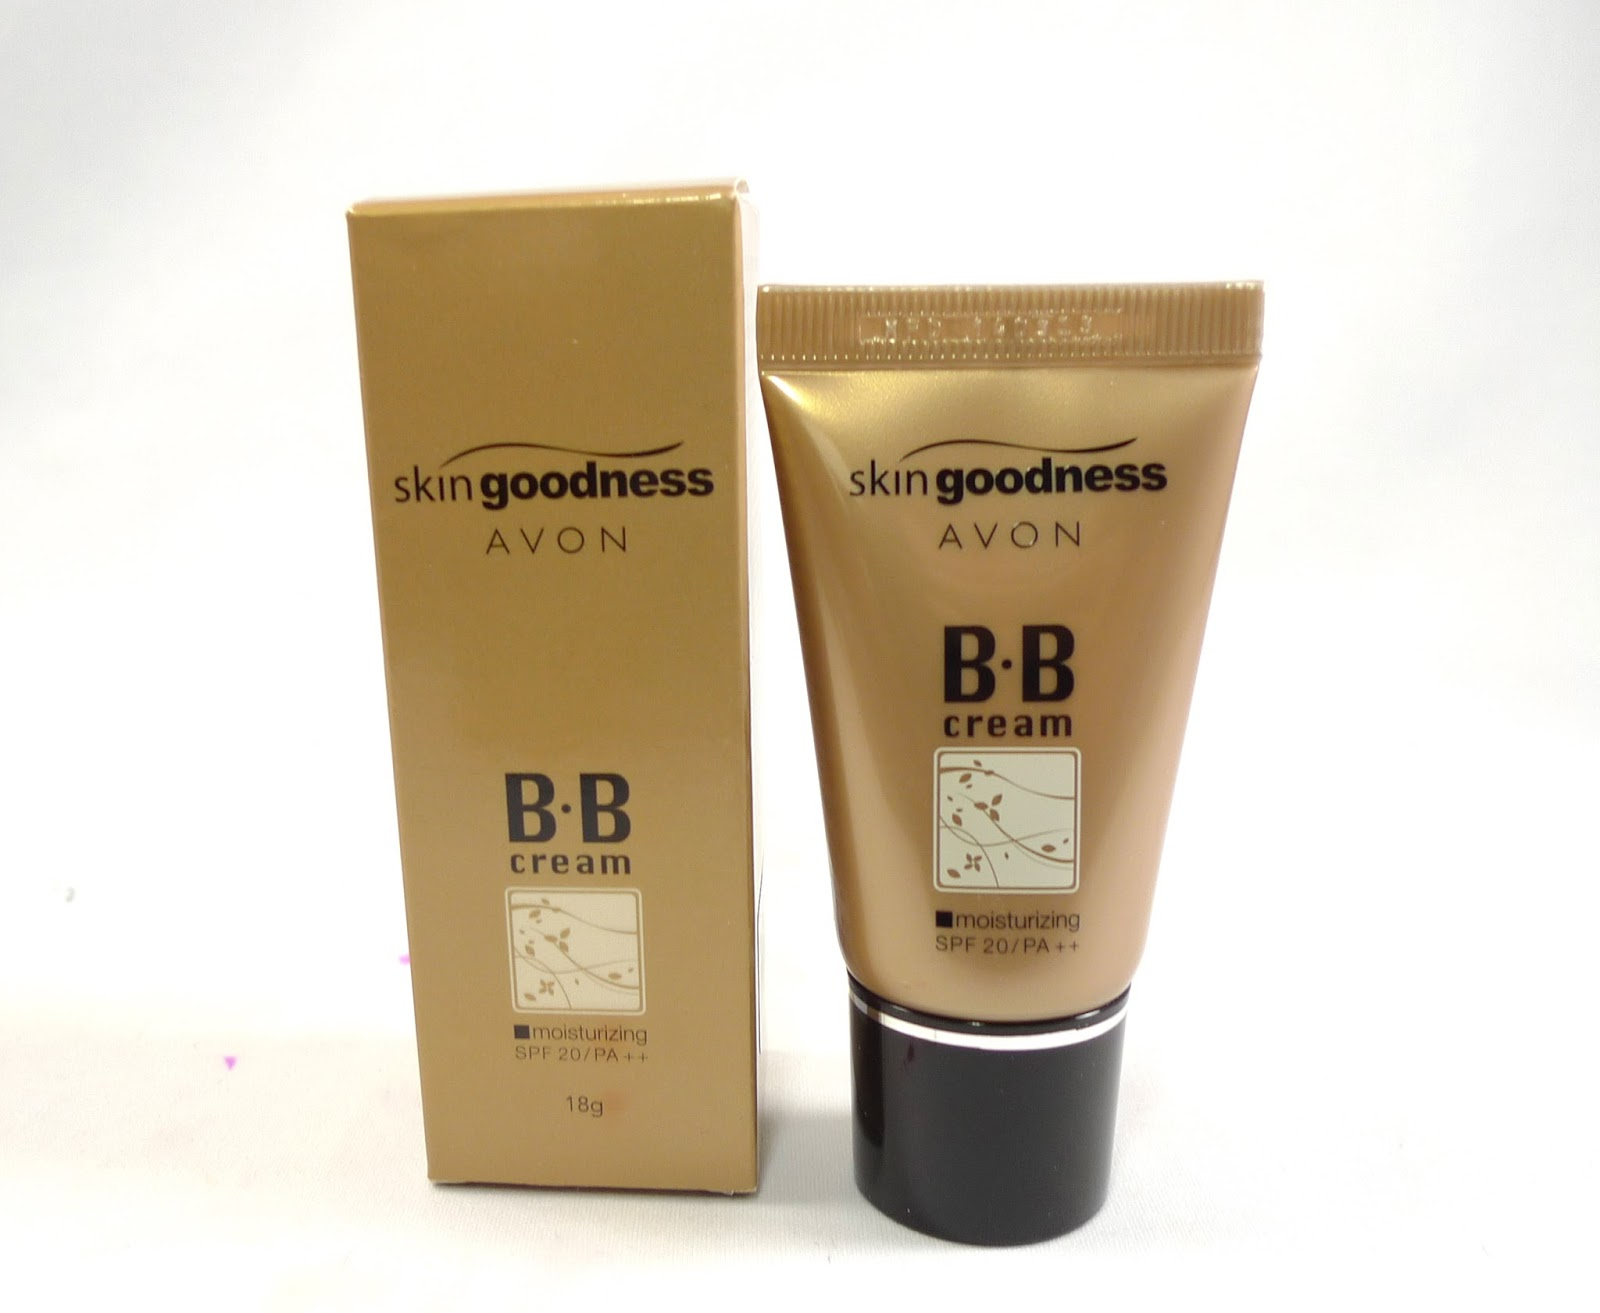 Review: Avon Skin Goodness BB Cream